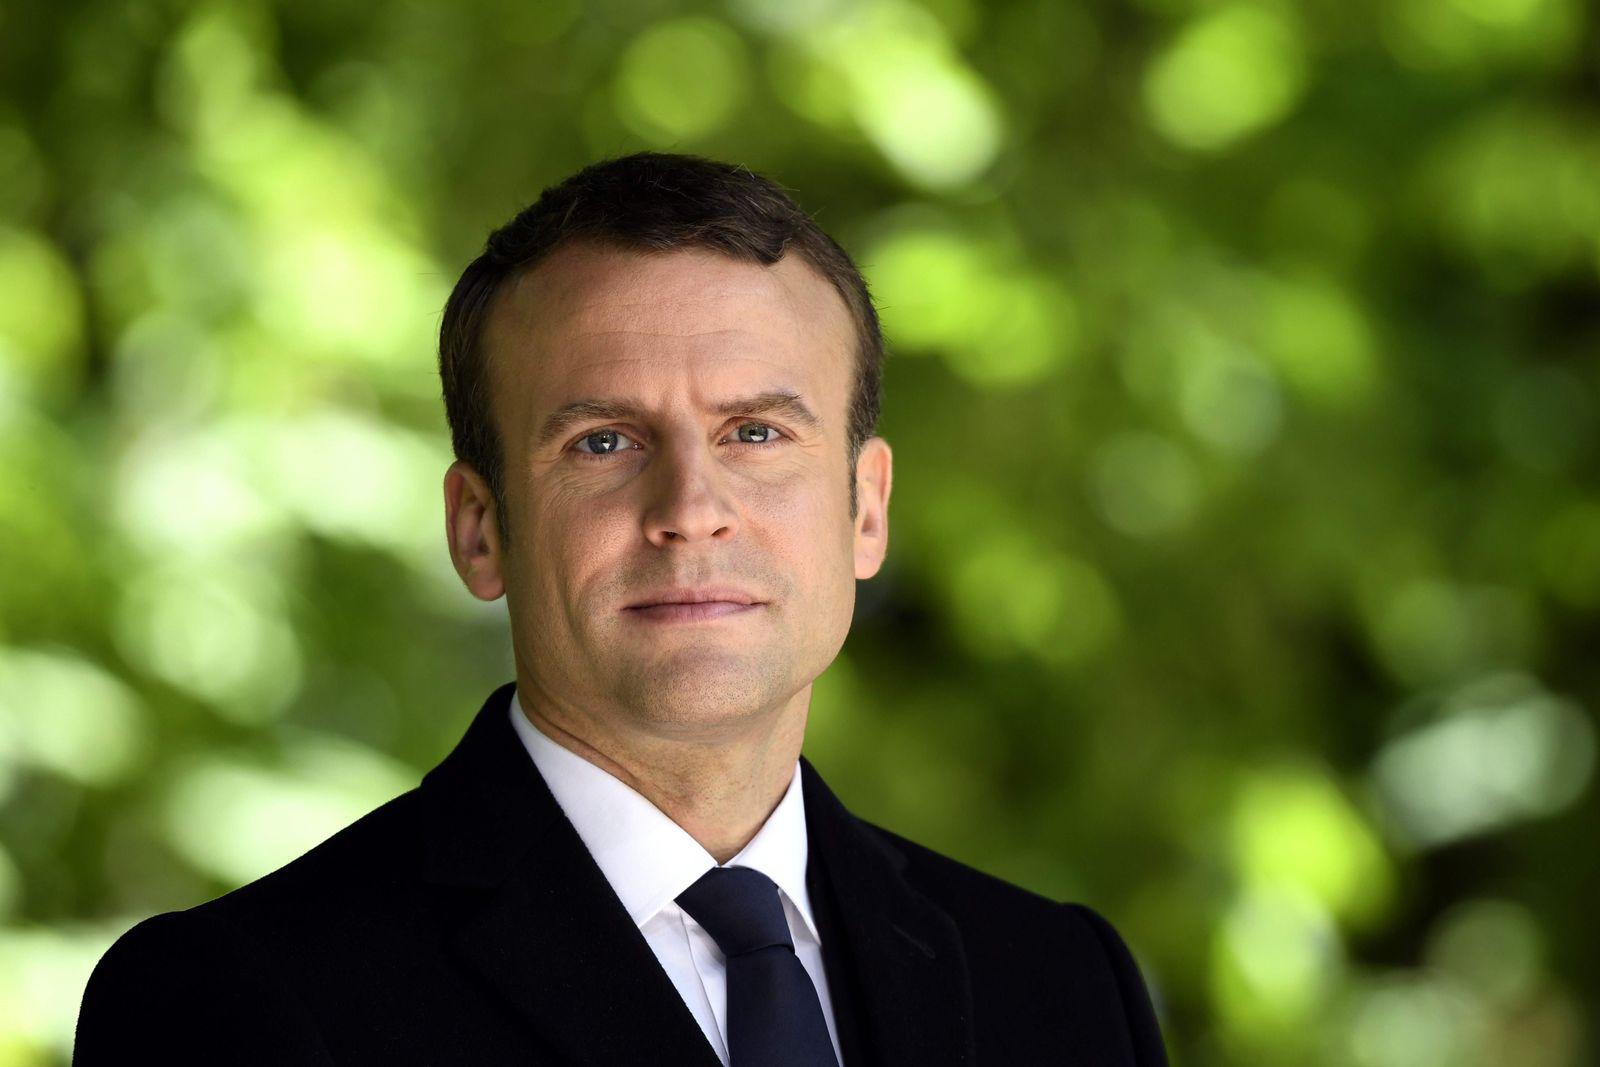 FRANCE-POLITICS-SLAVERY